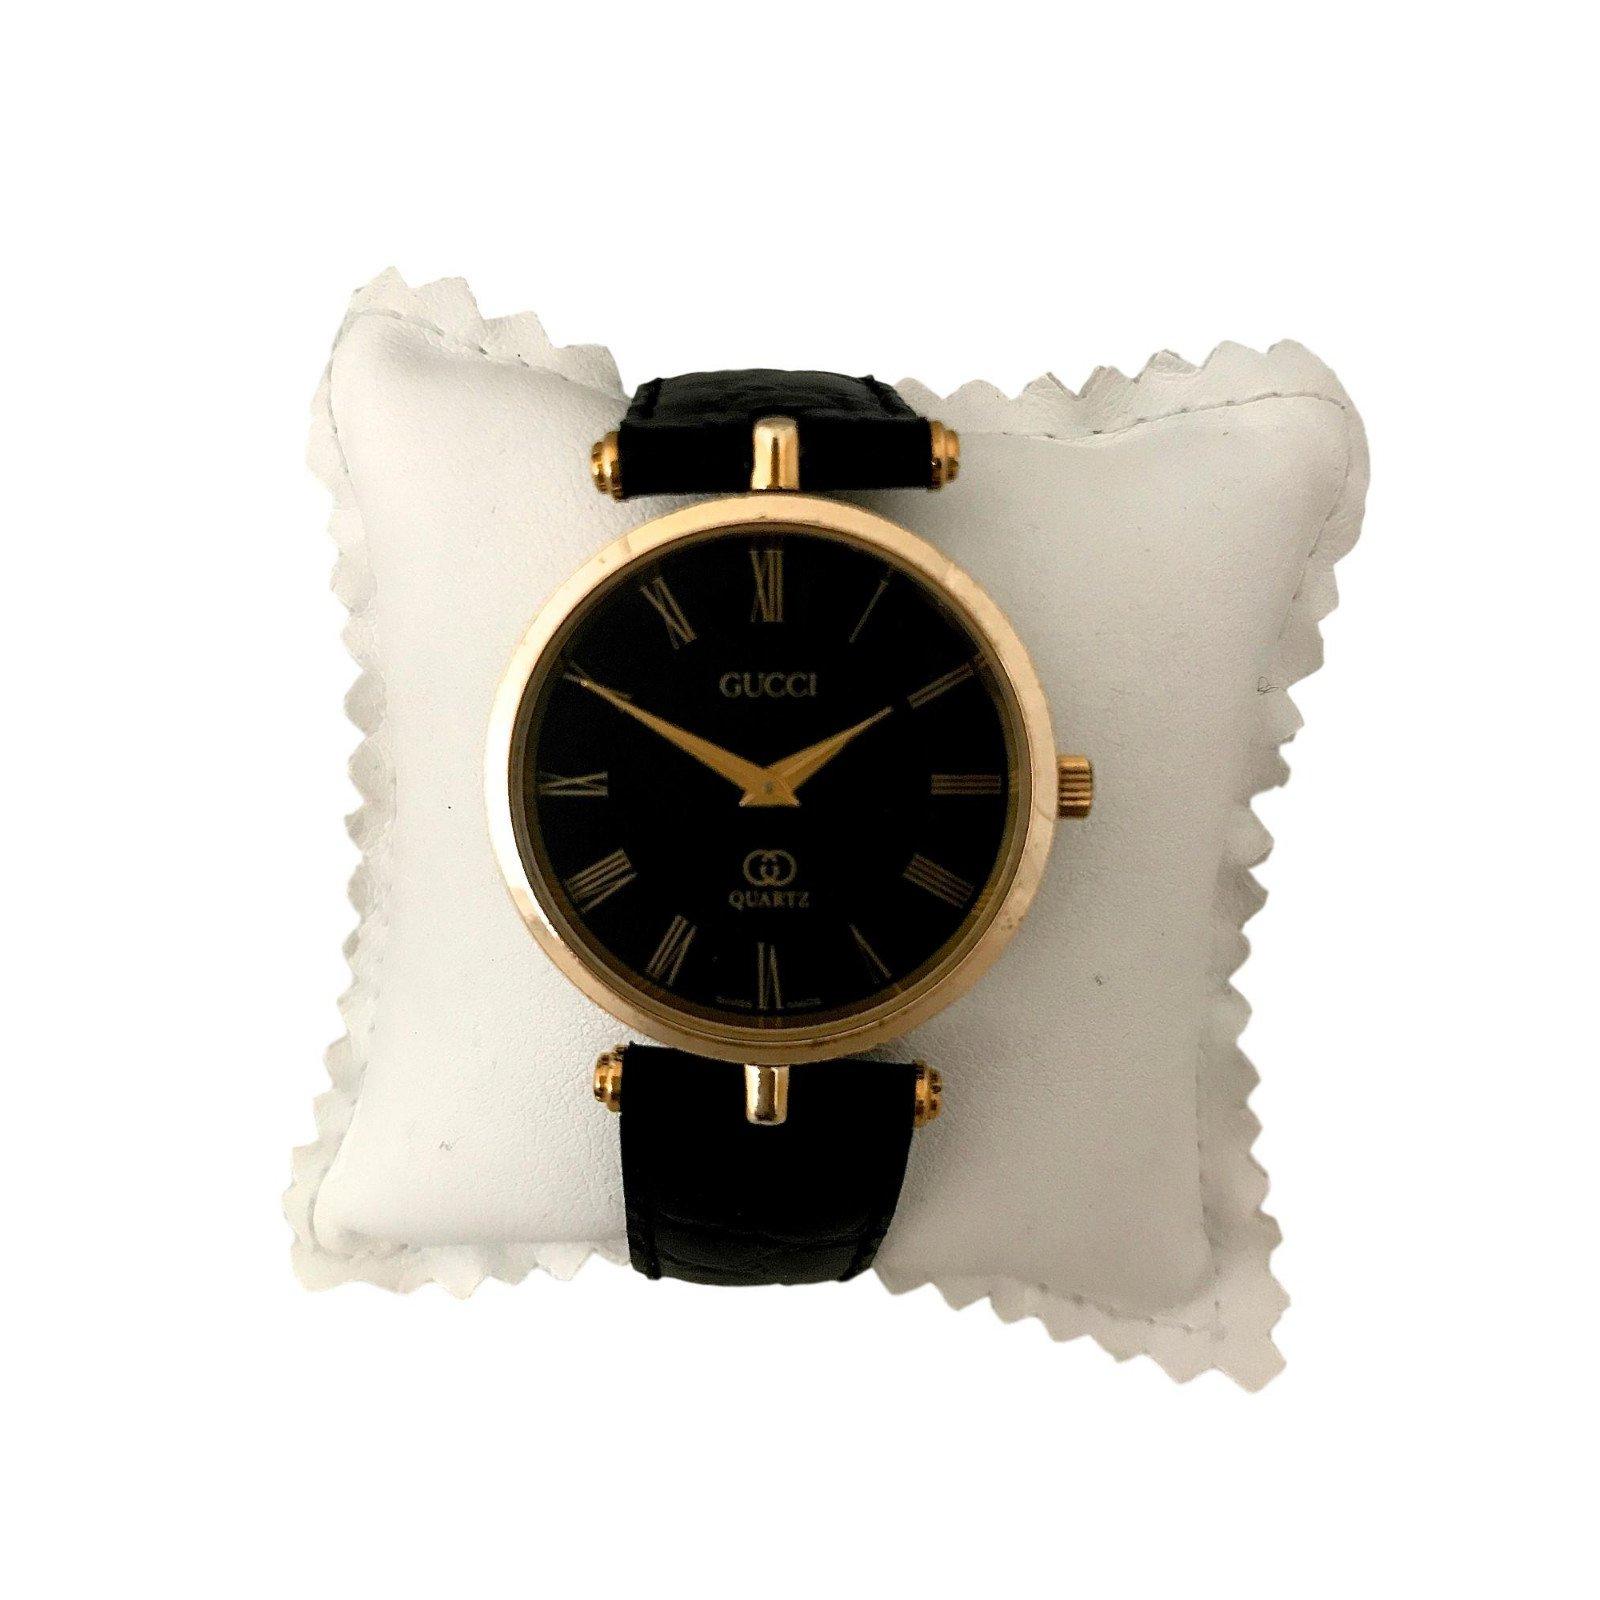 dcd3f5df384 Gucci Watch Fine Watches Gold Plated Black Ref 72286 Joli Closet